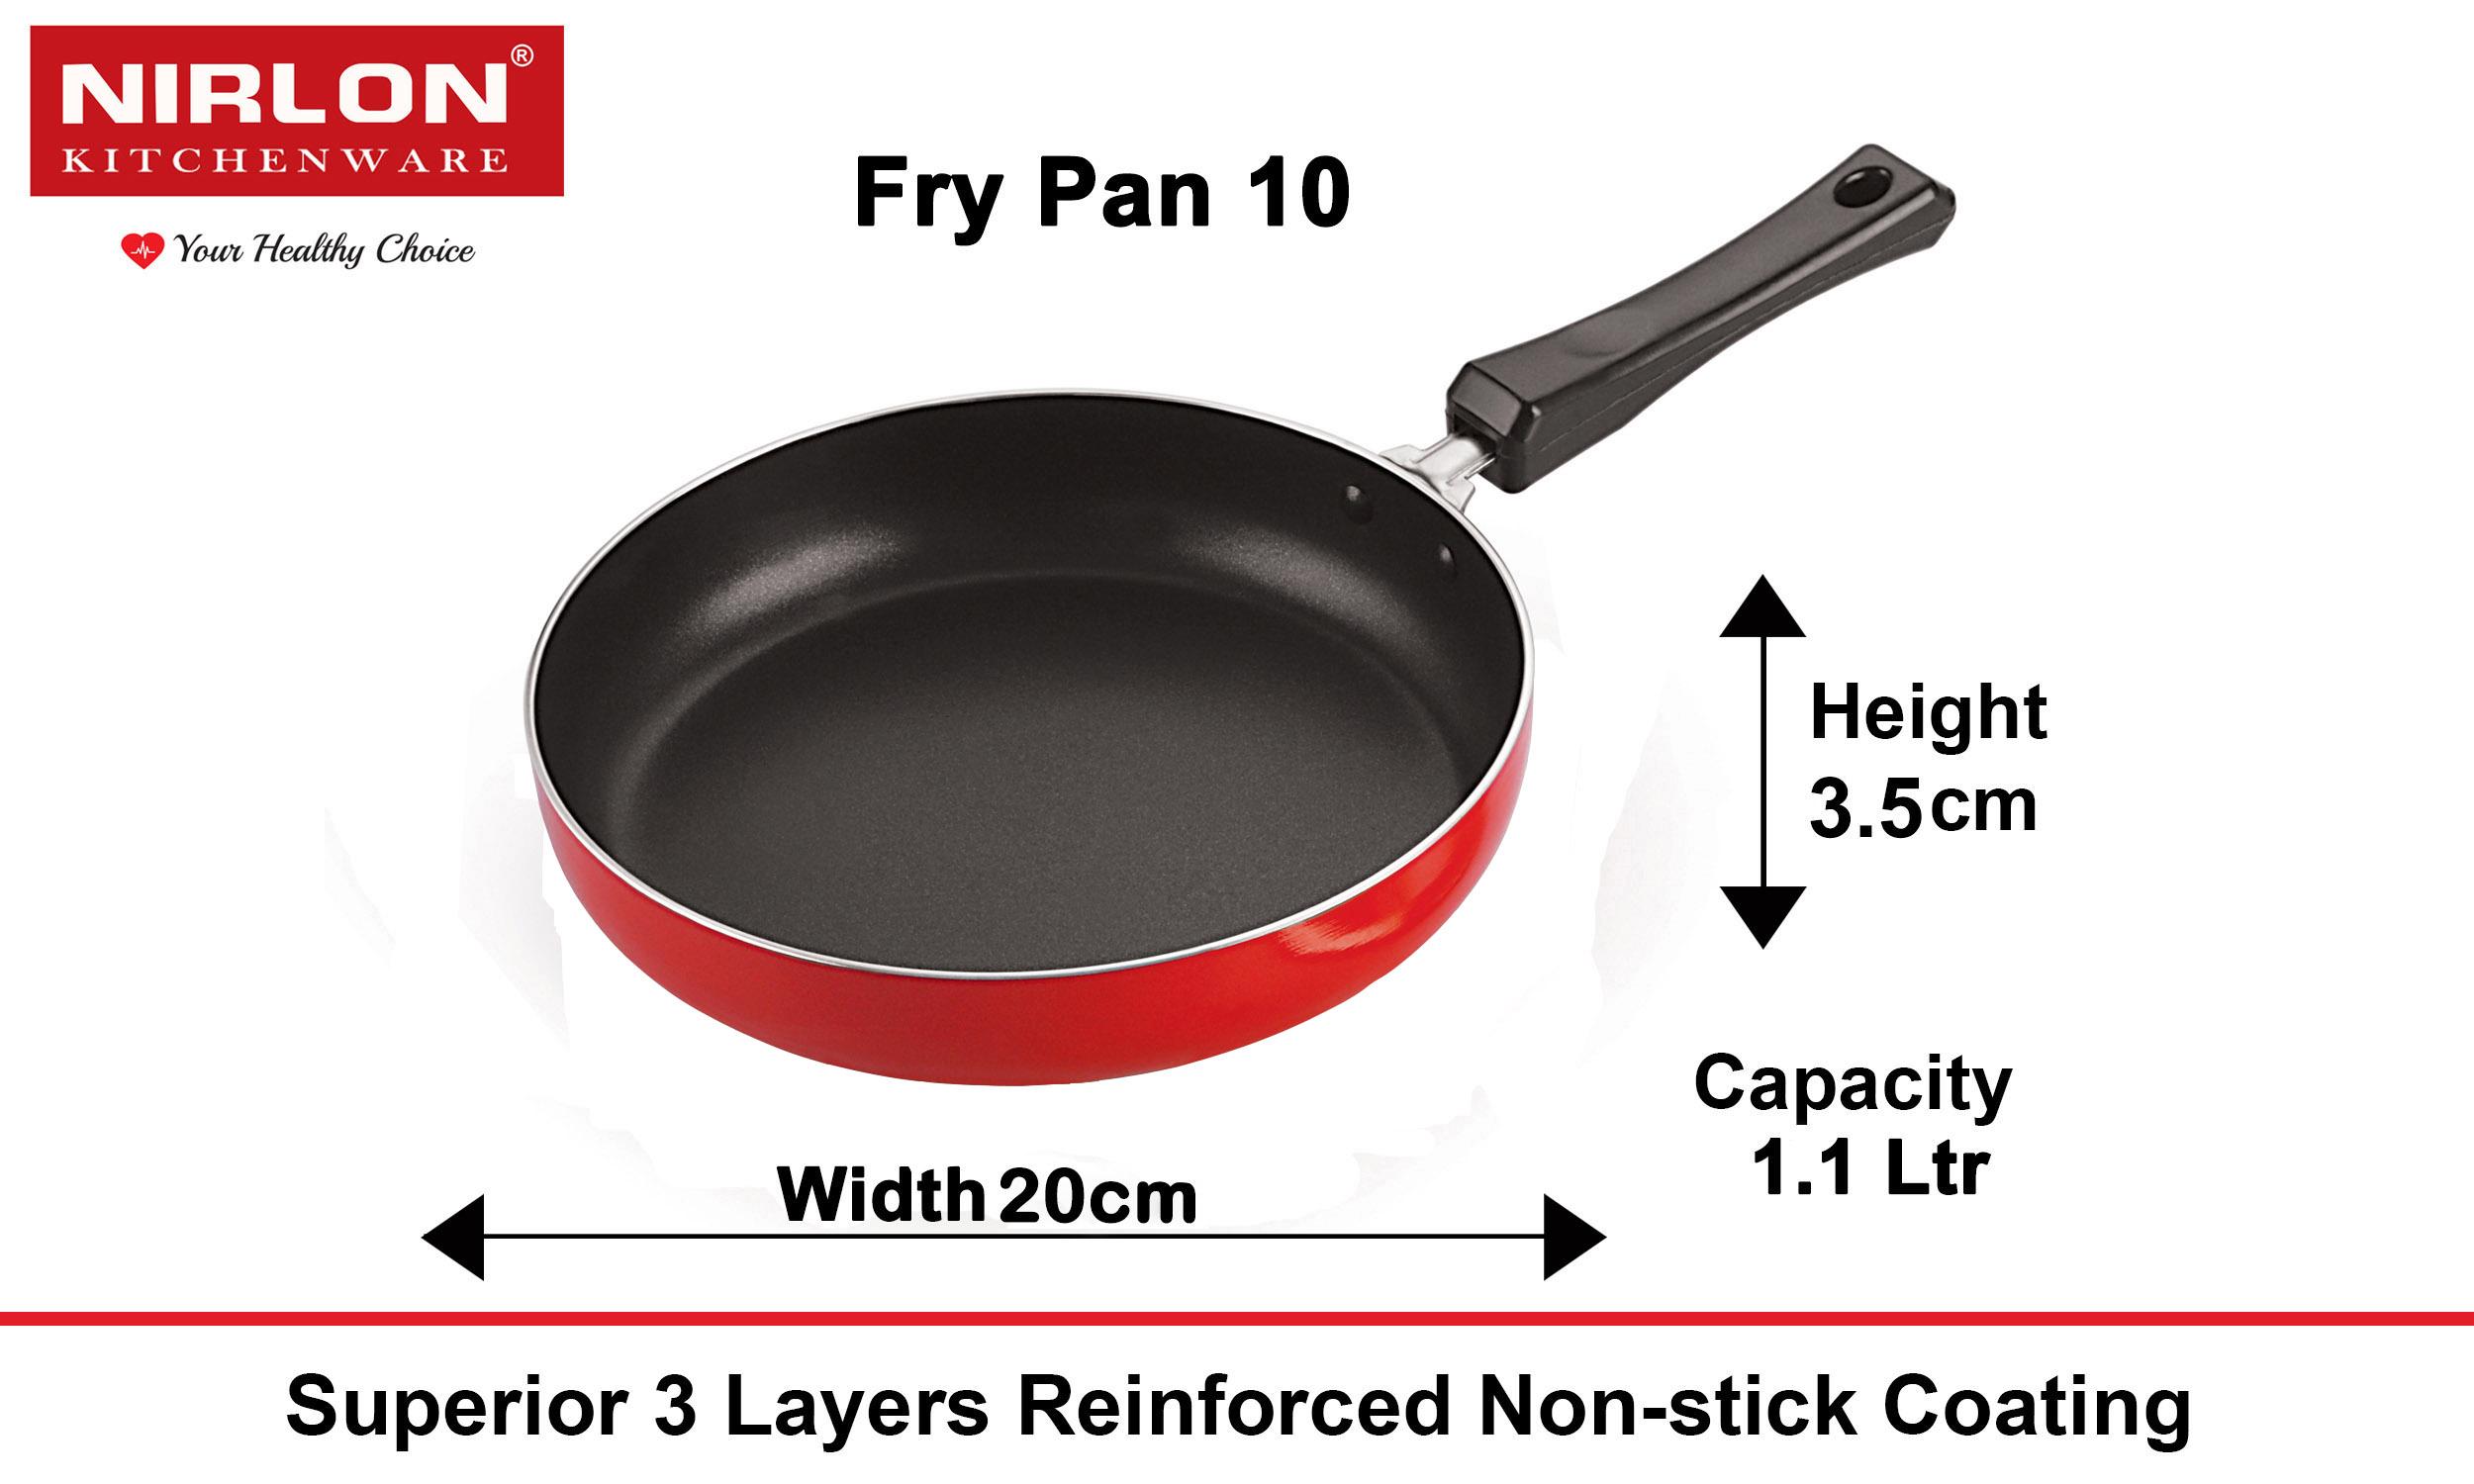 Nirlon Aluminium Non Stick Fry Pan, 20 cm, Red and Black